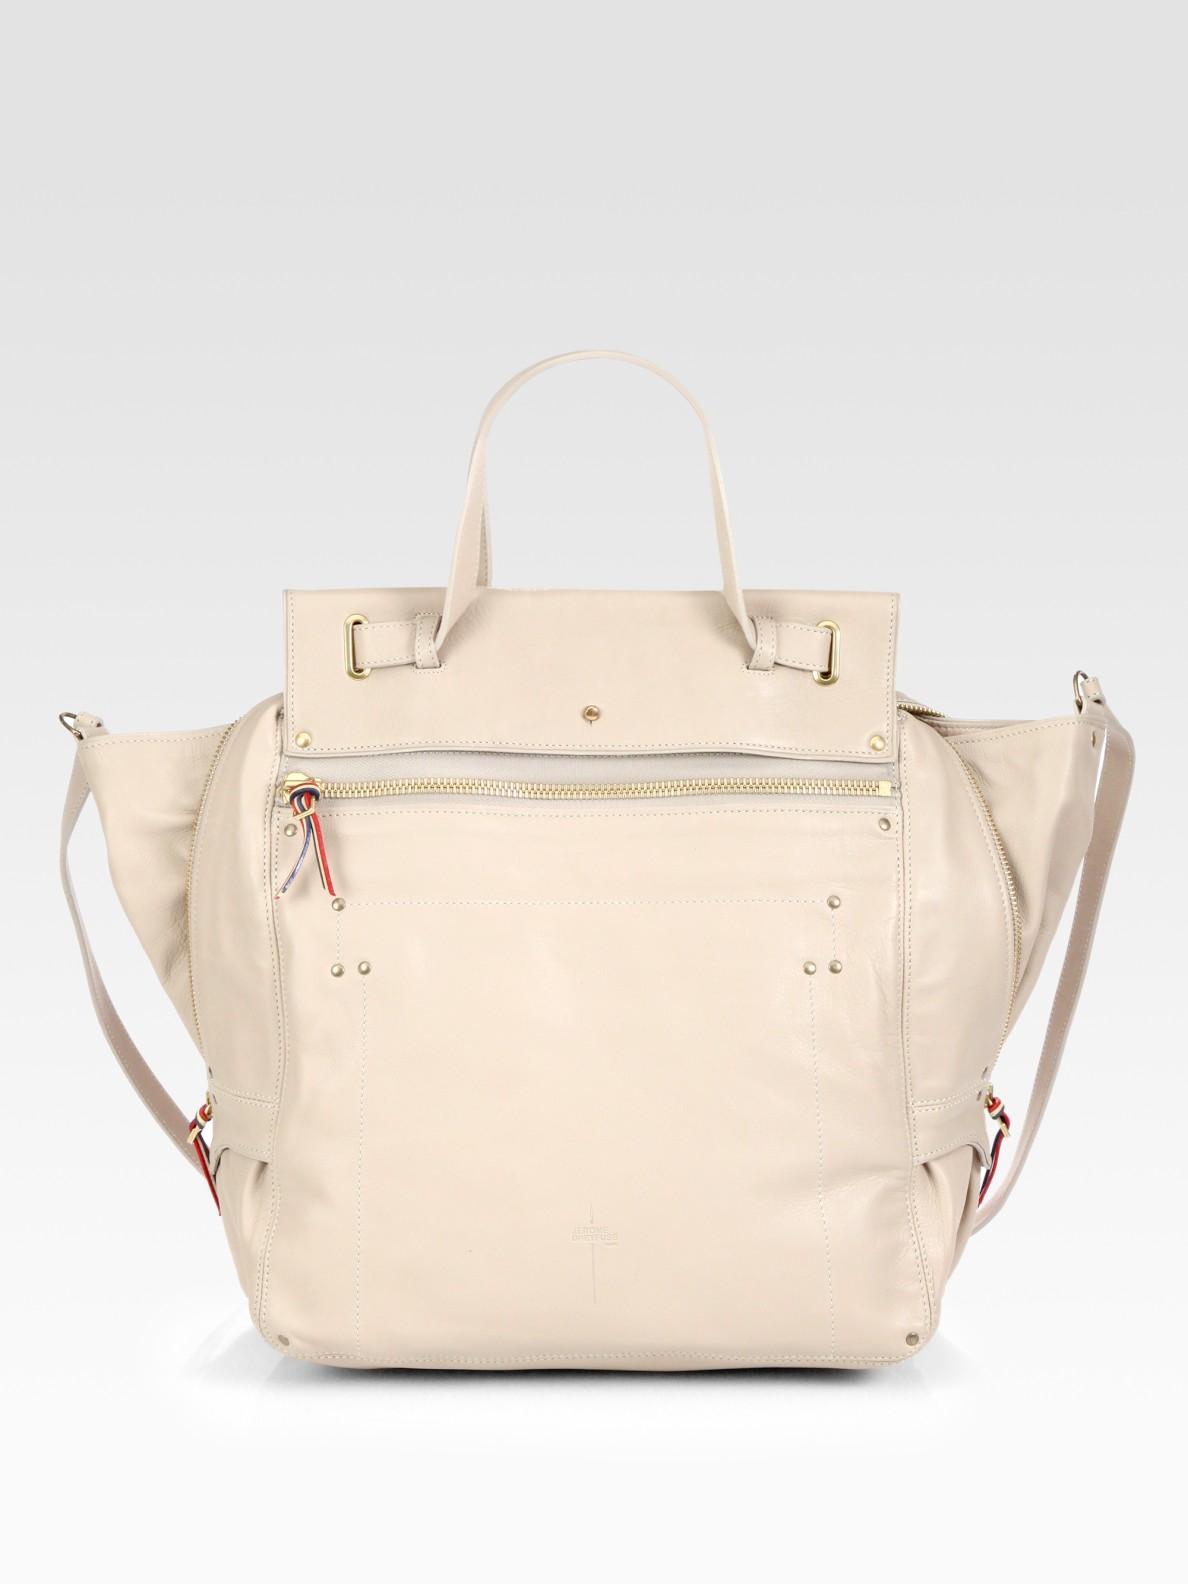 Wonderful Slouchy Leather Shoulder Bag  Cognac  Shoulder Bags  PEDRO